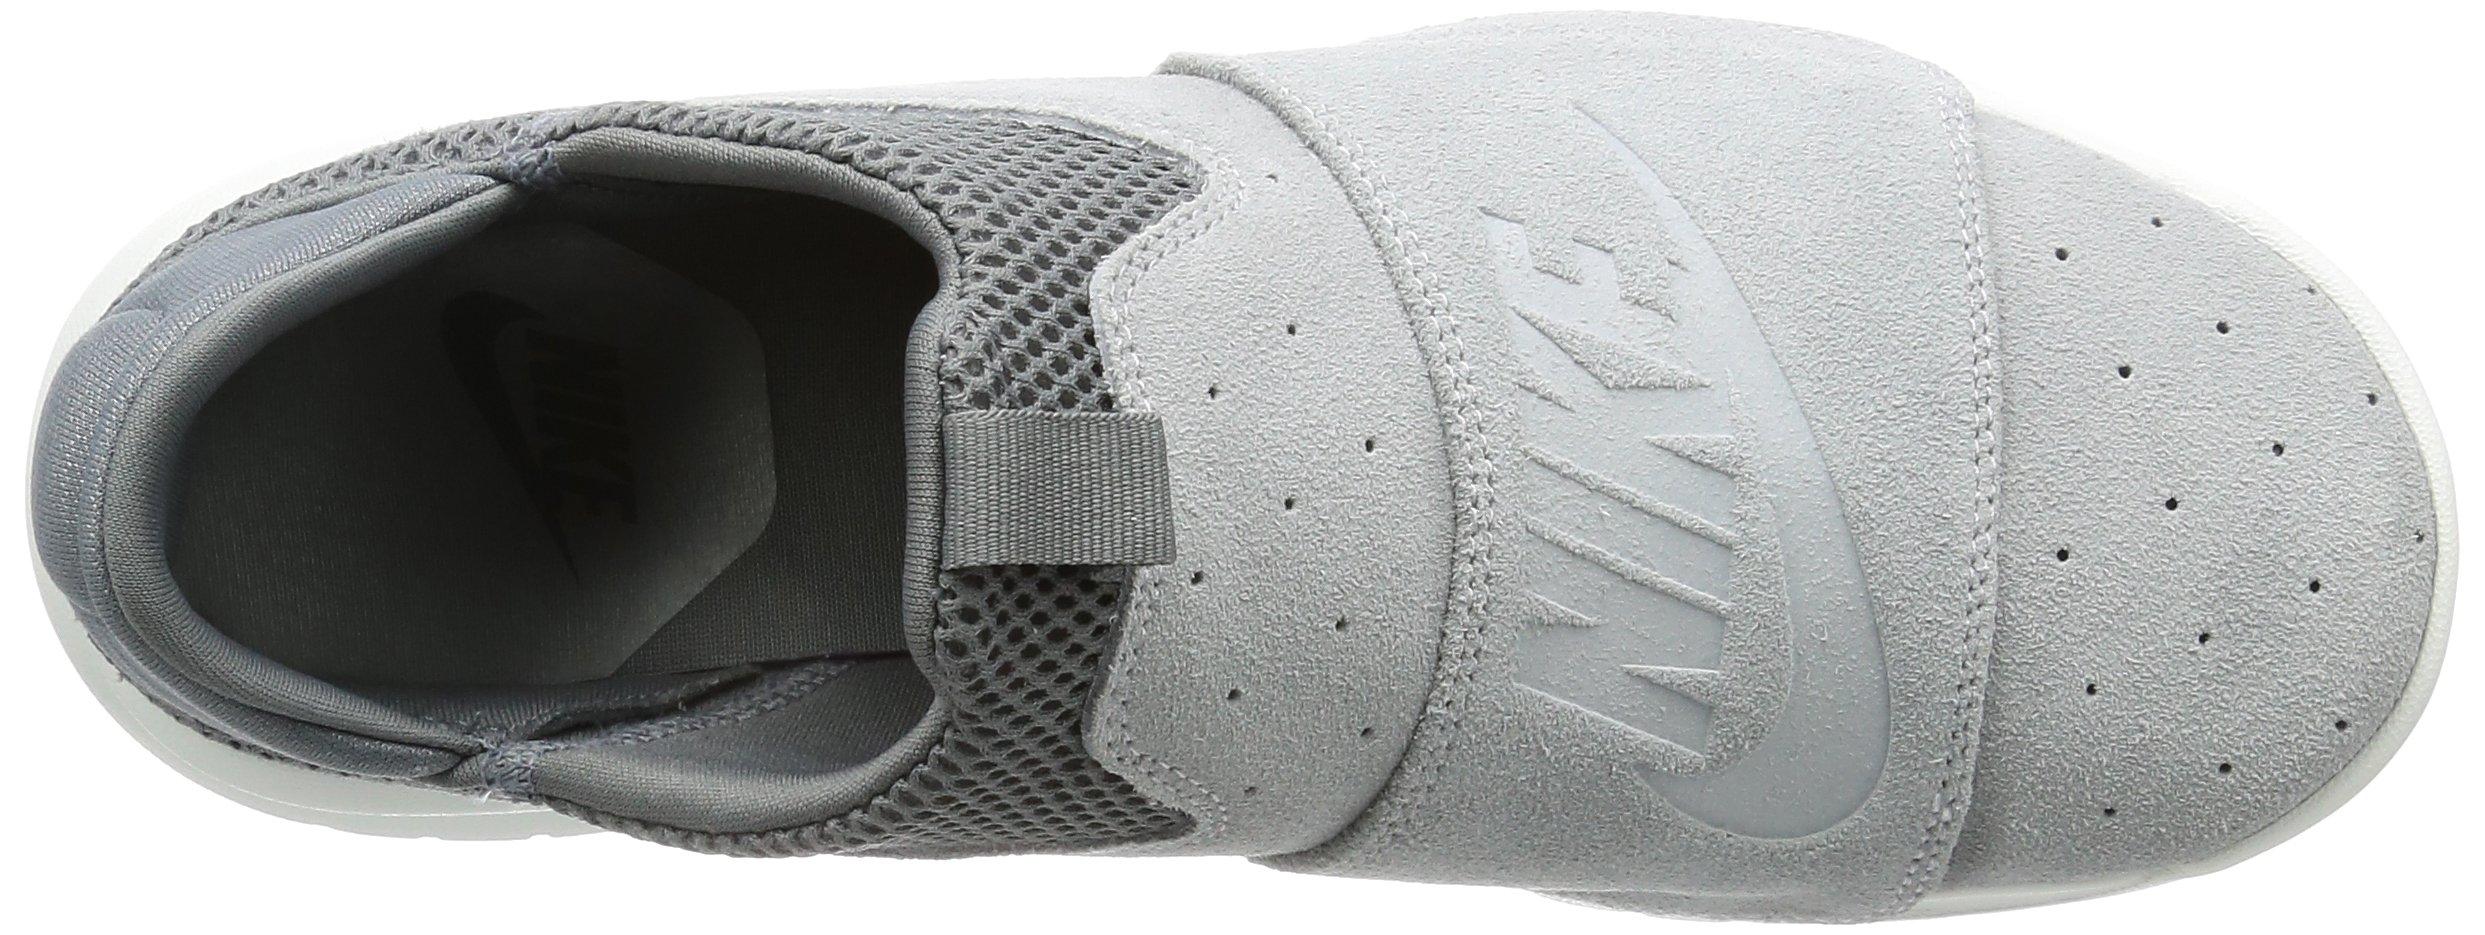 New Nike Men's Benassi Slip Sneaker Grey/Off White 8